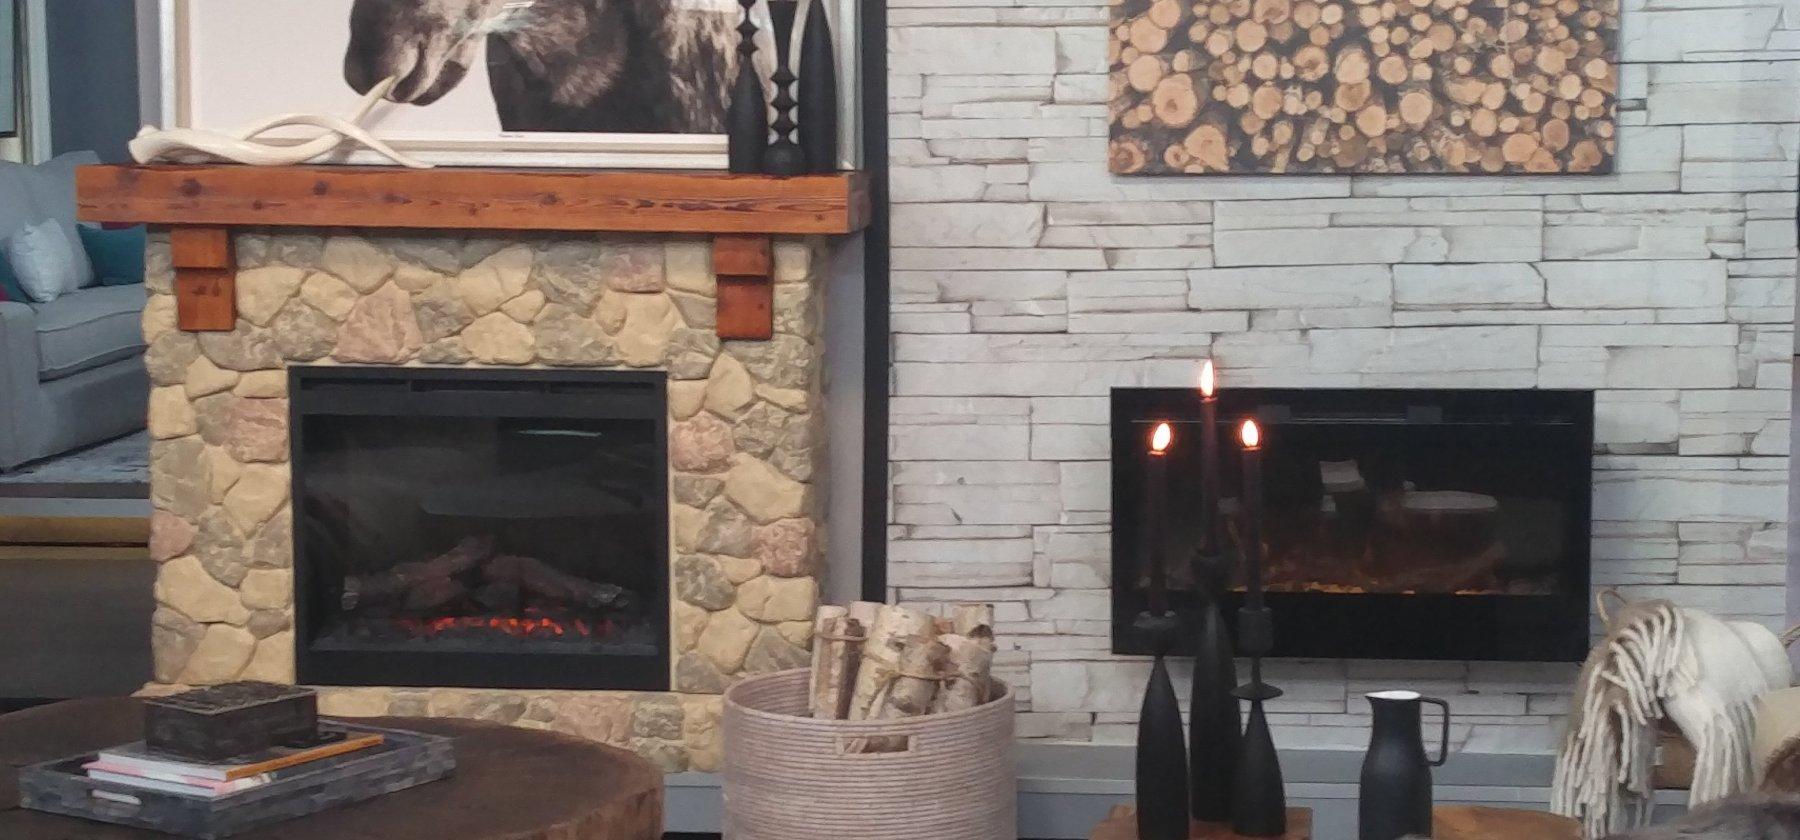 CityLine Hearth Manor Fireplaces